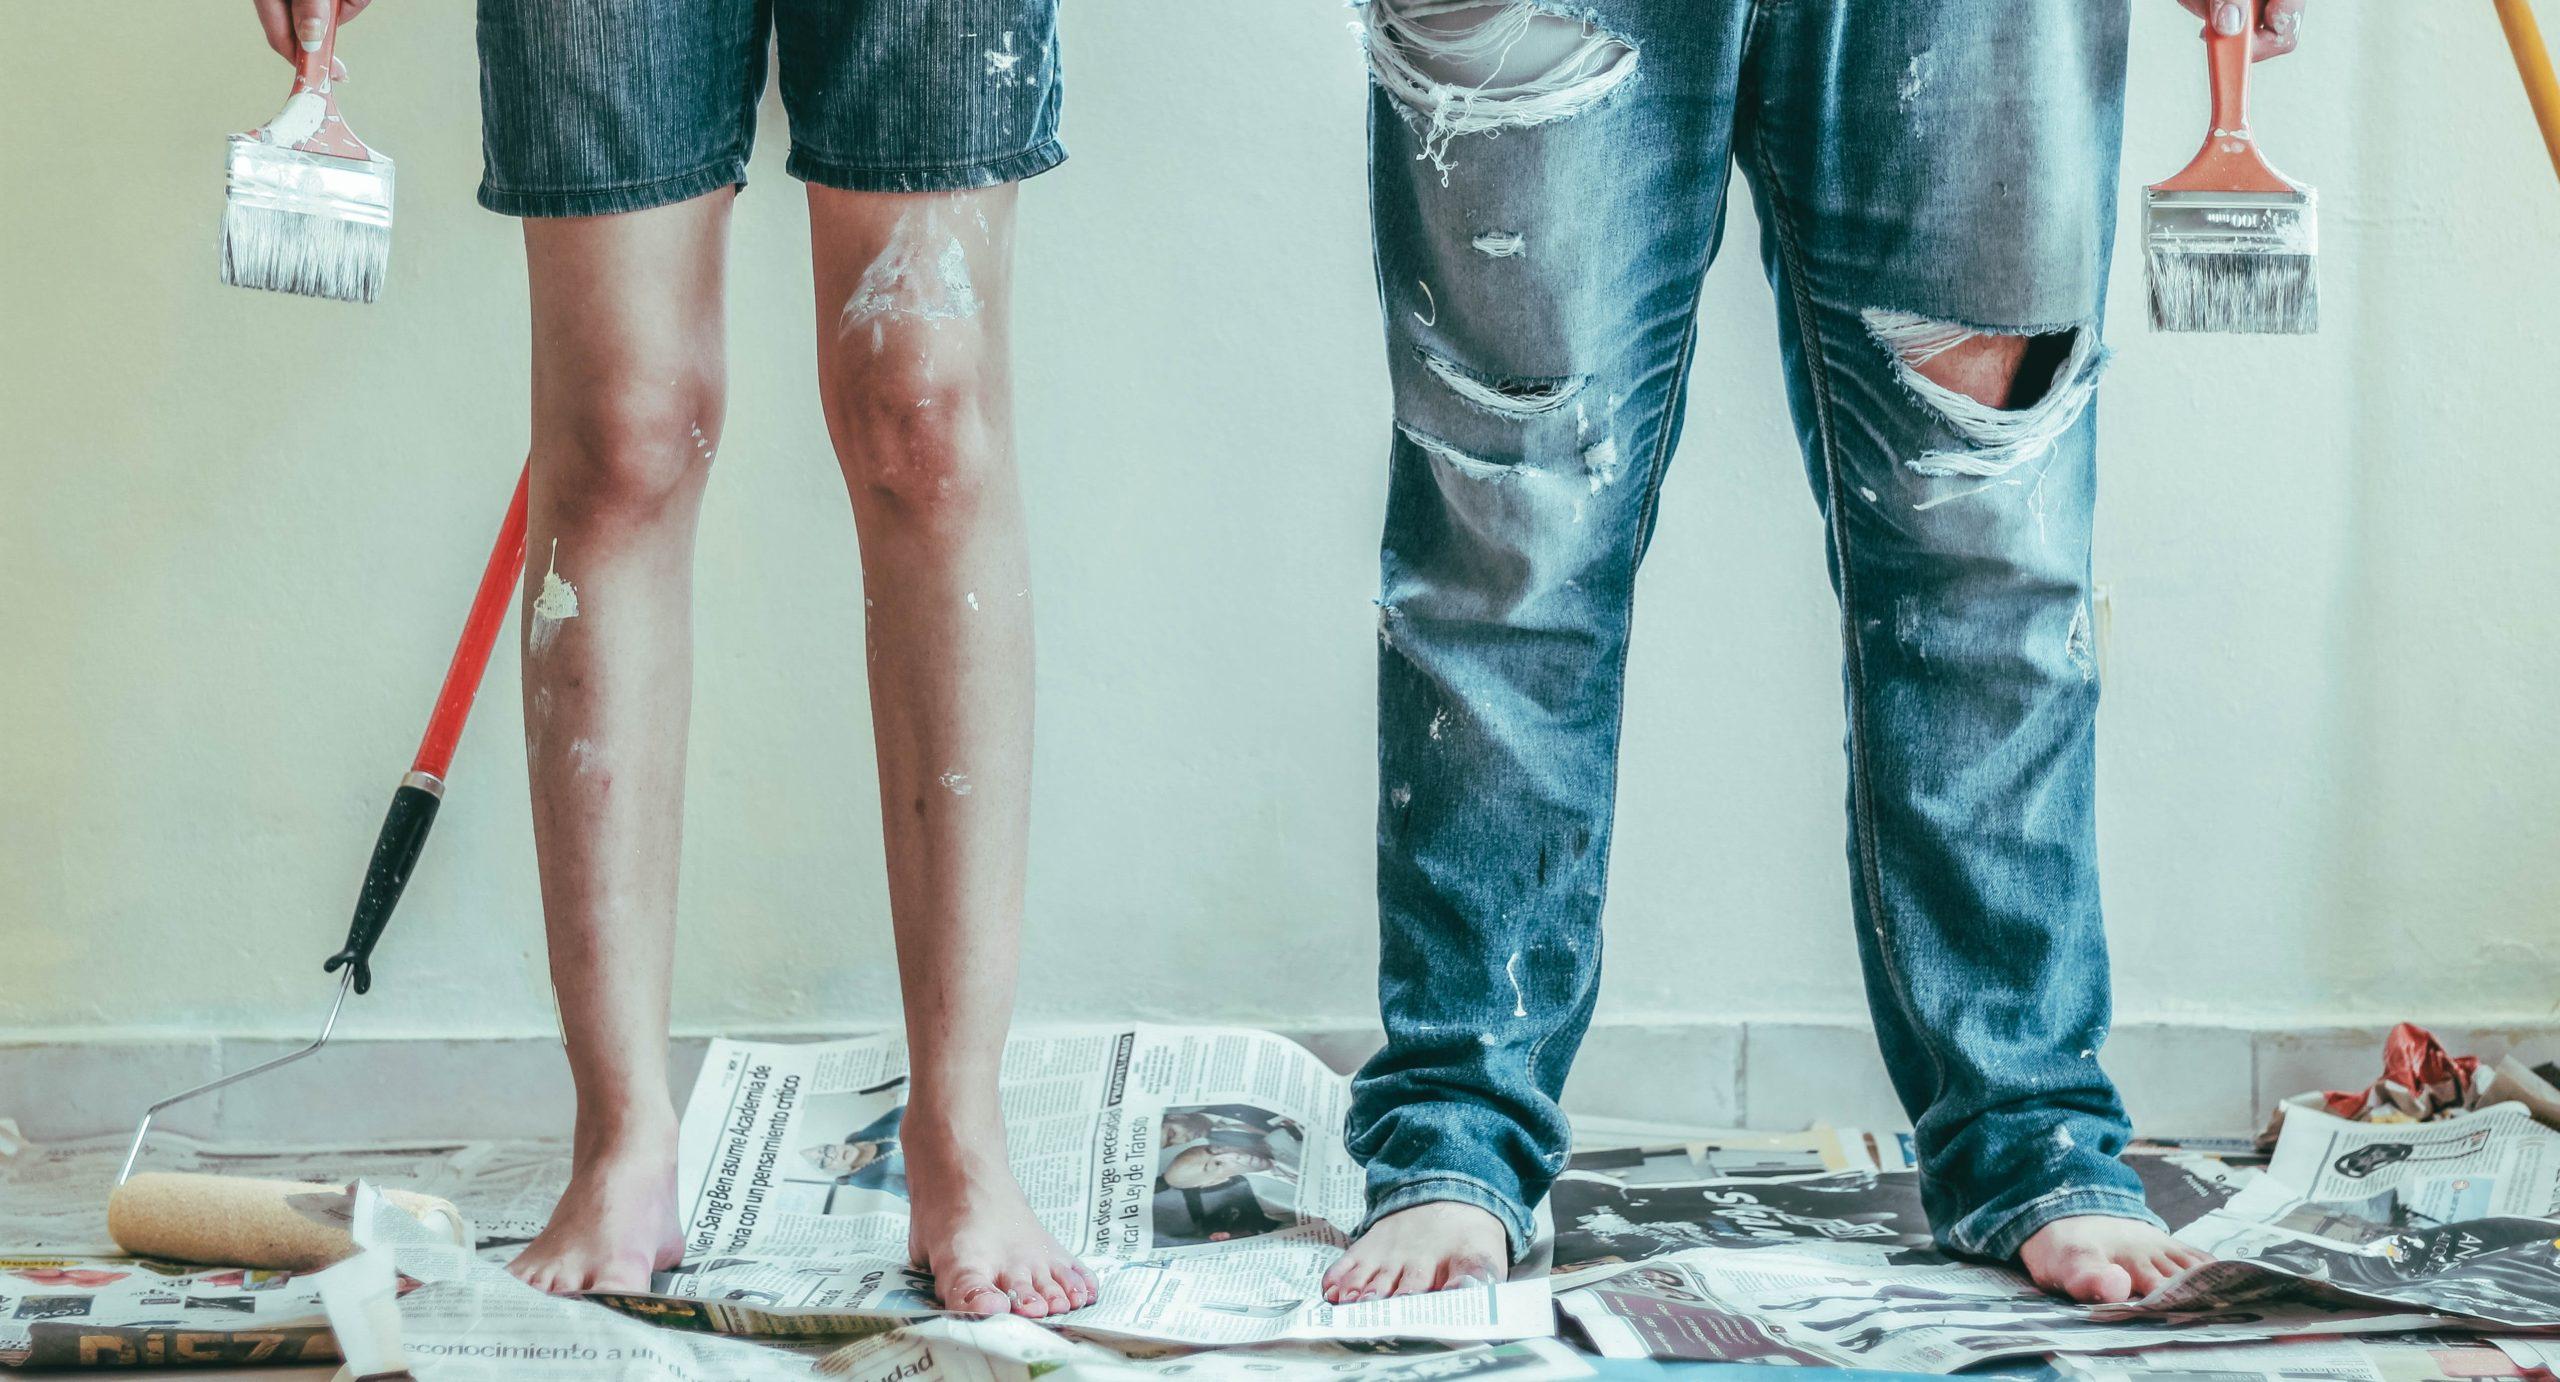 The DIY Tasks Save Brits Over £8,000